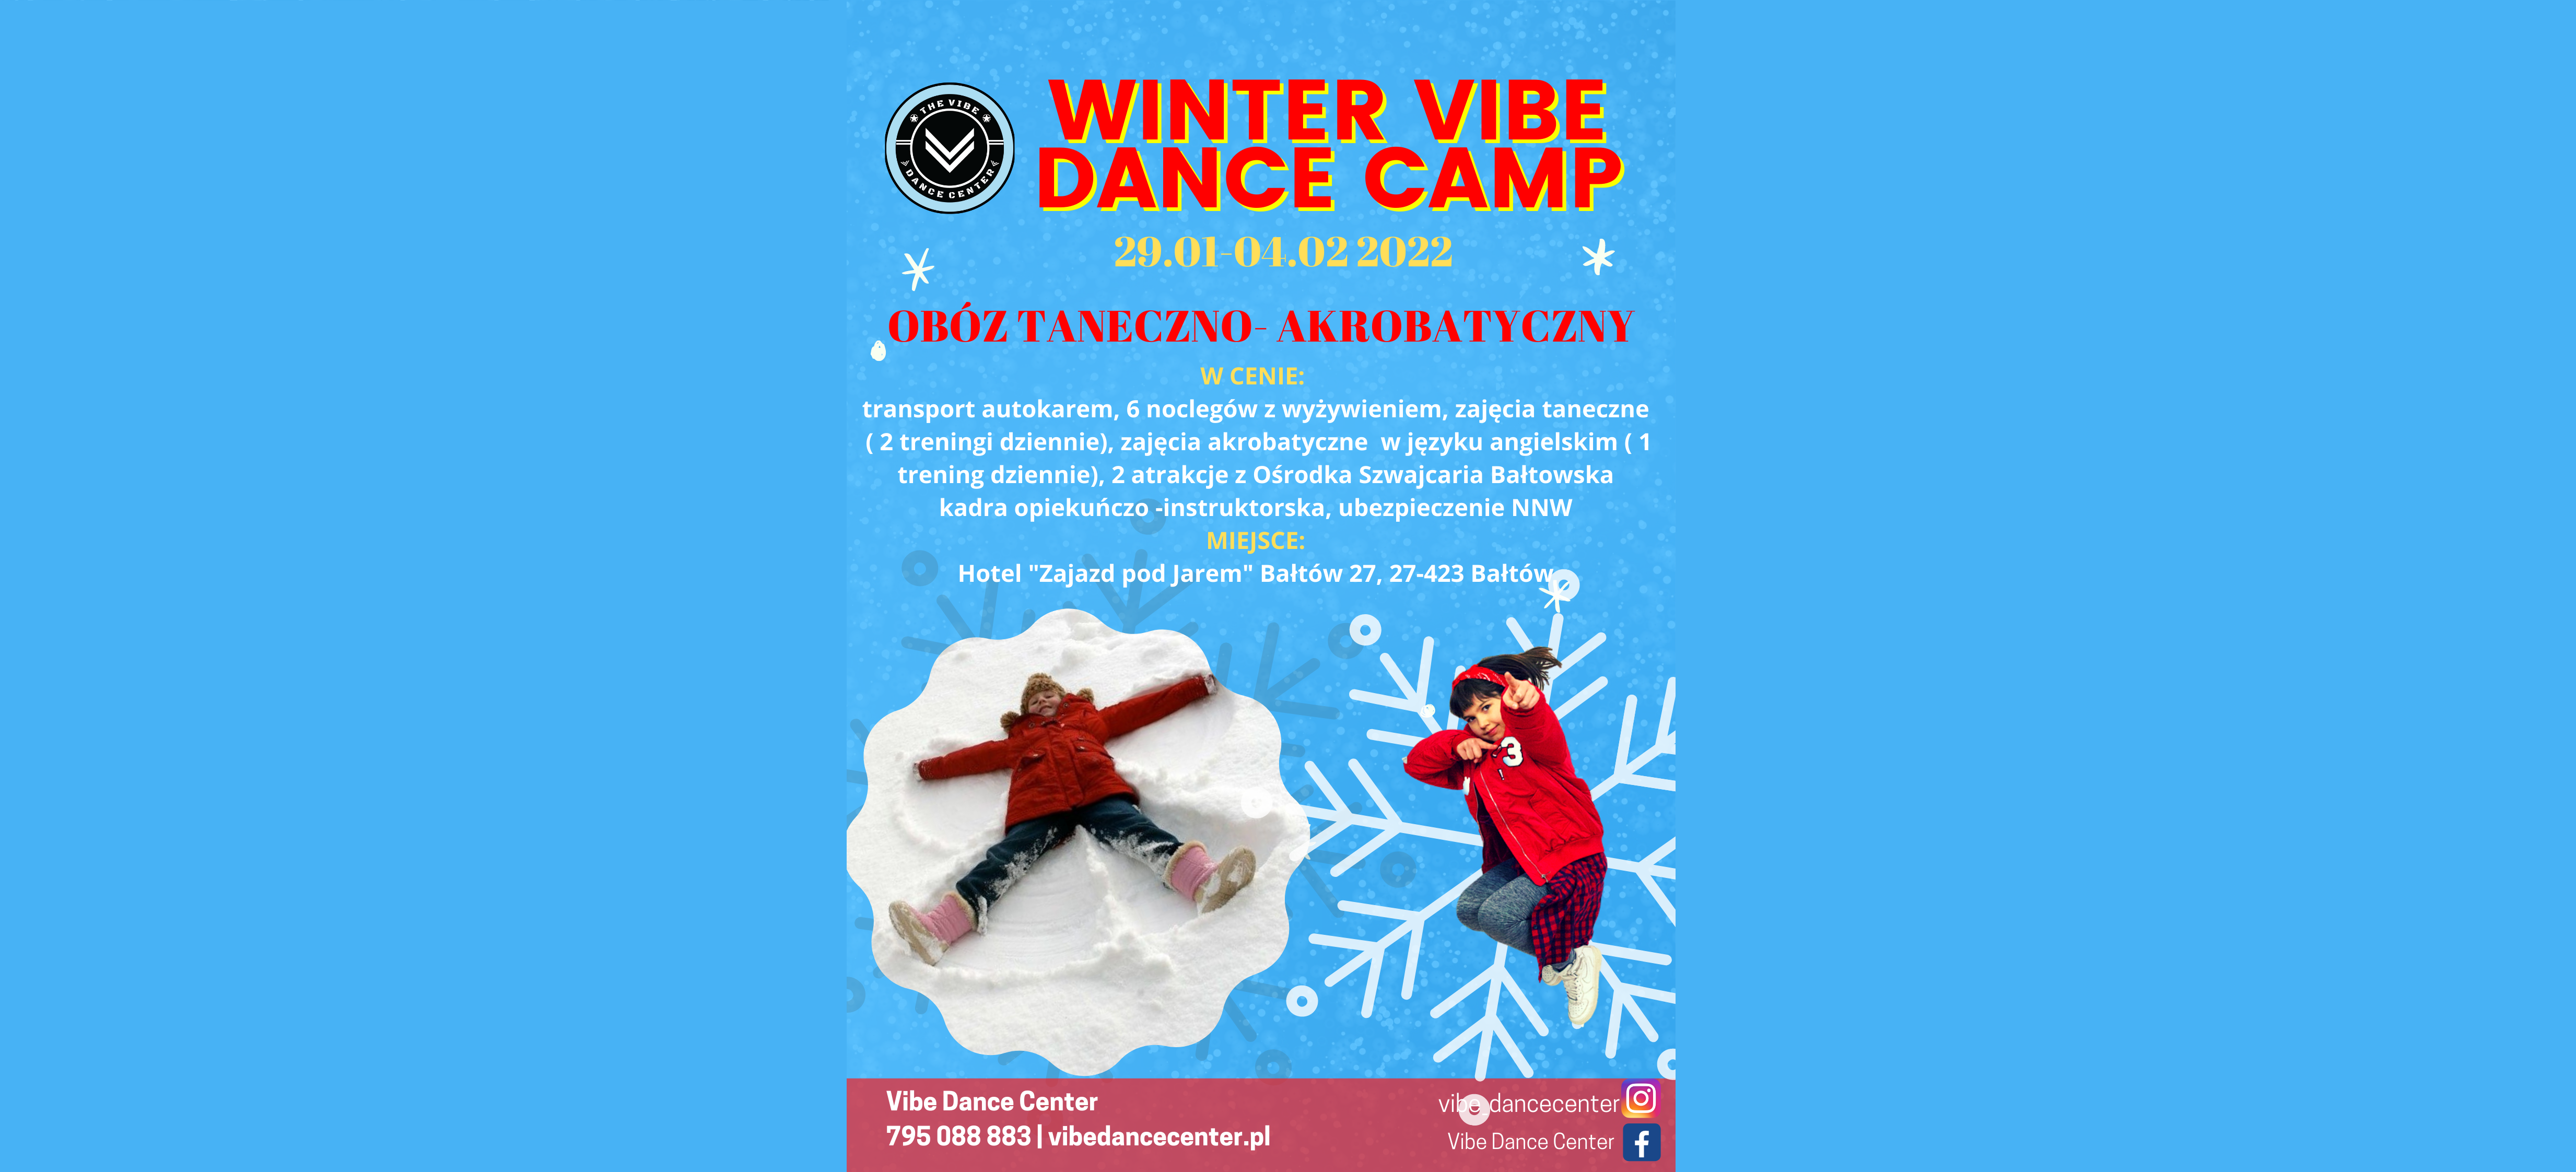 Winter Vibe Dance Camp 2022